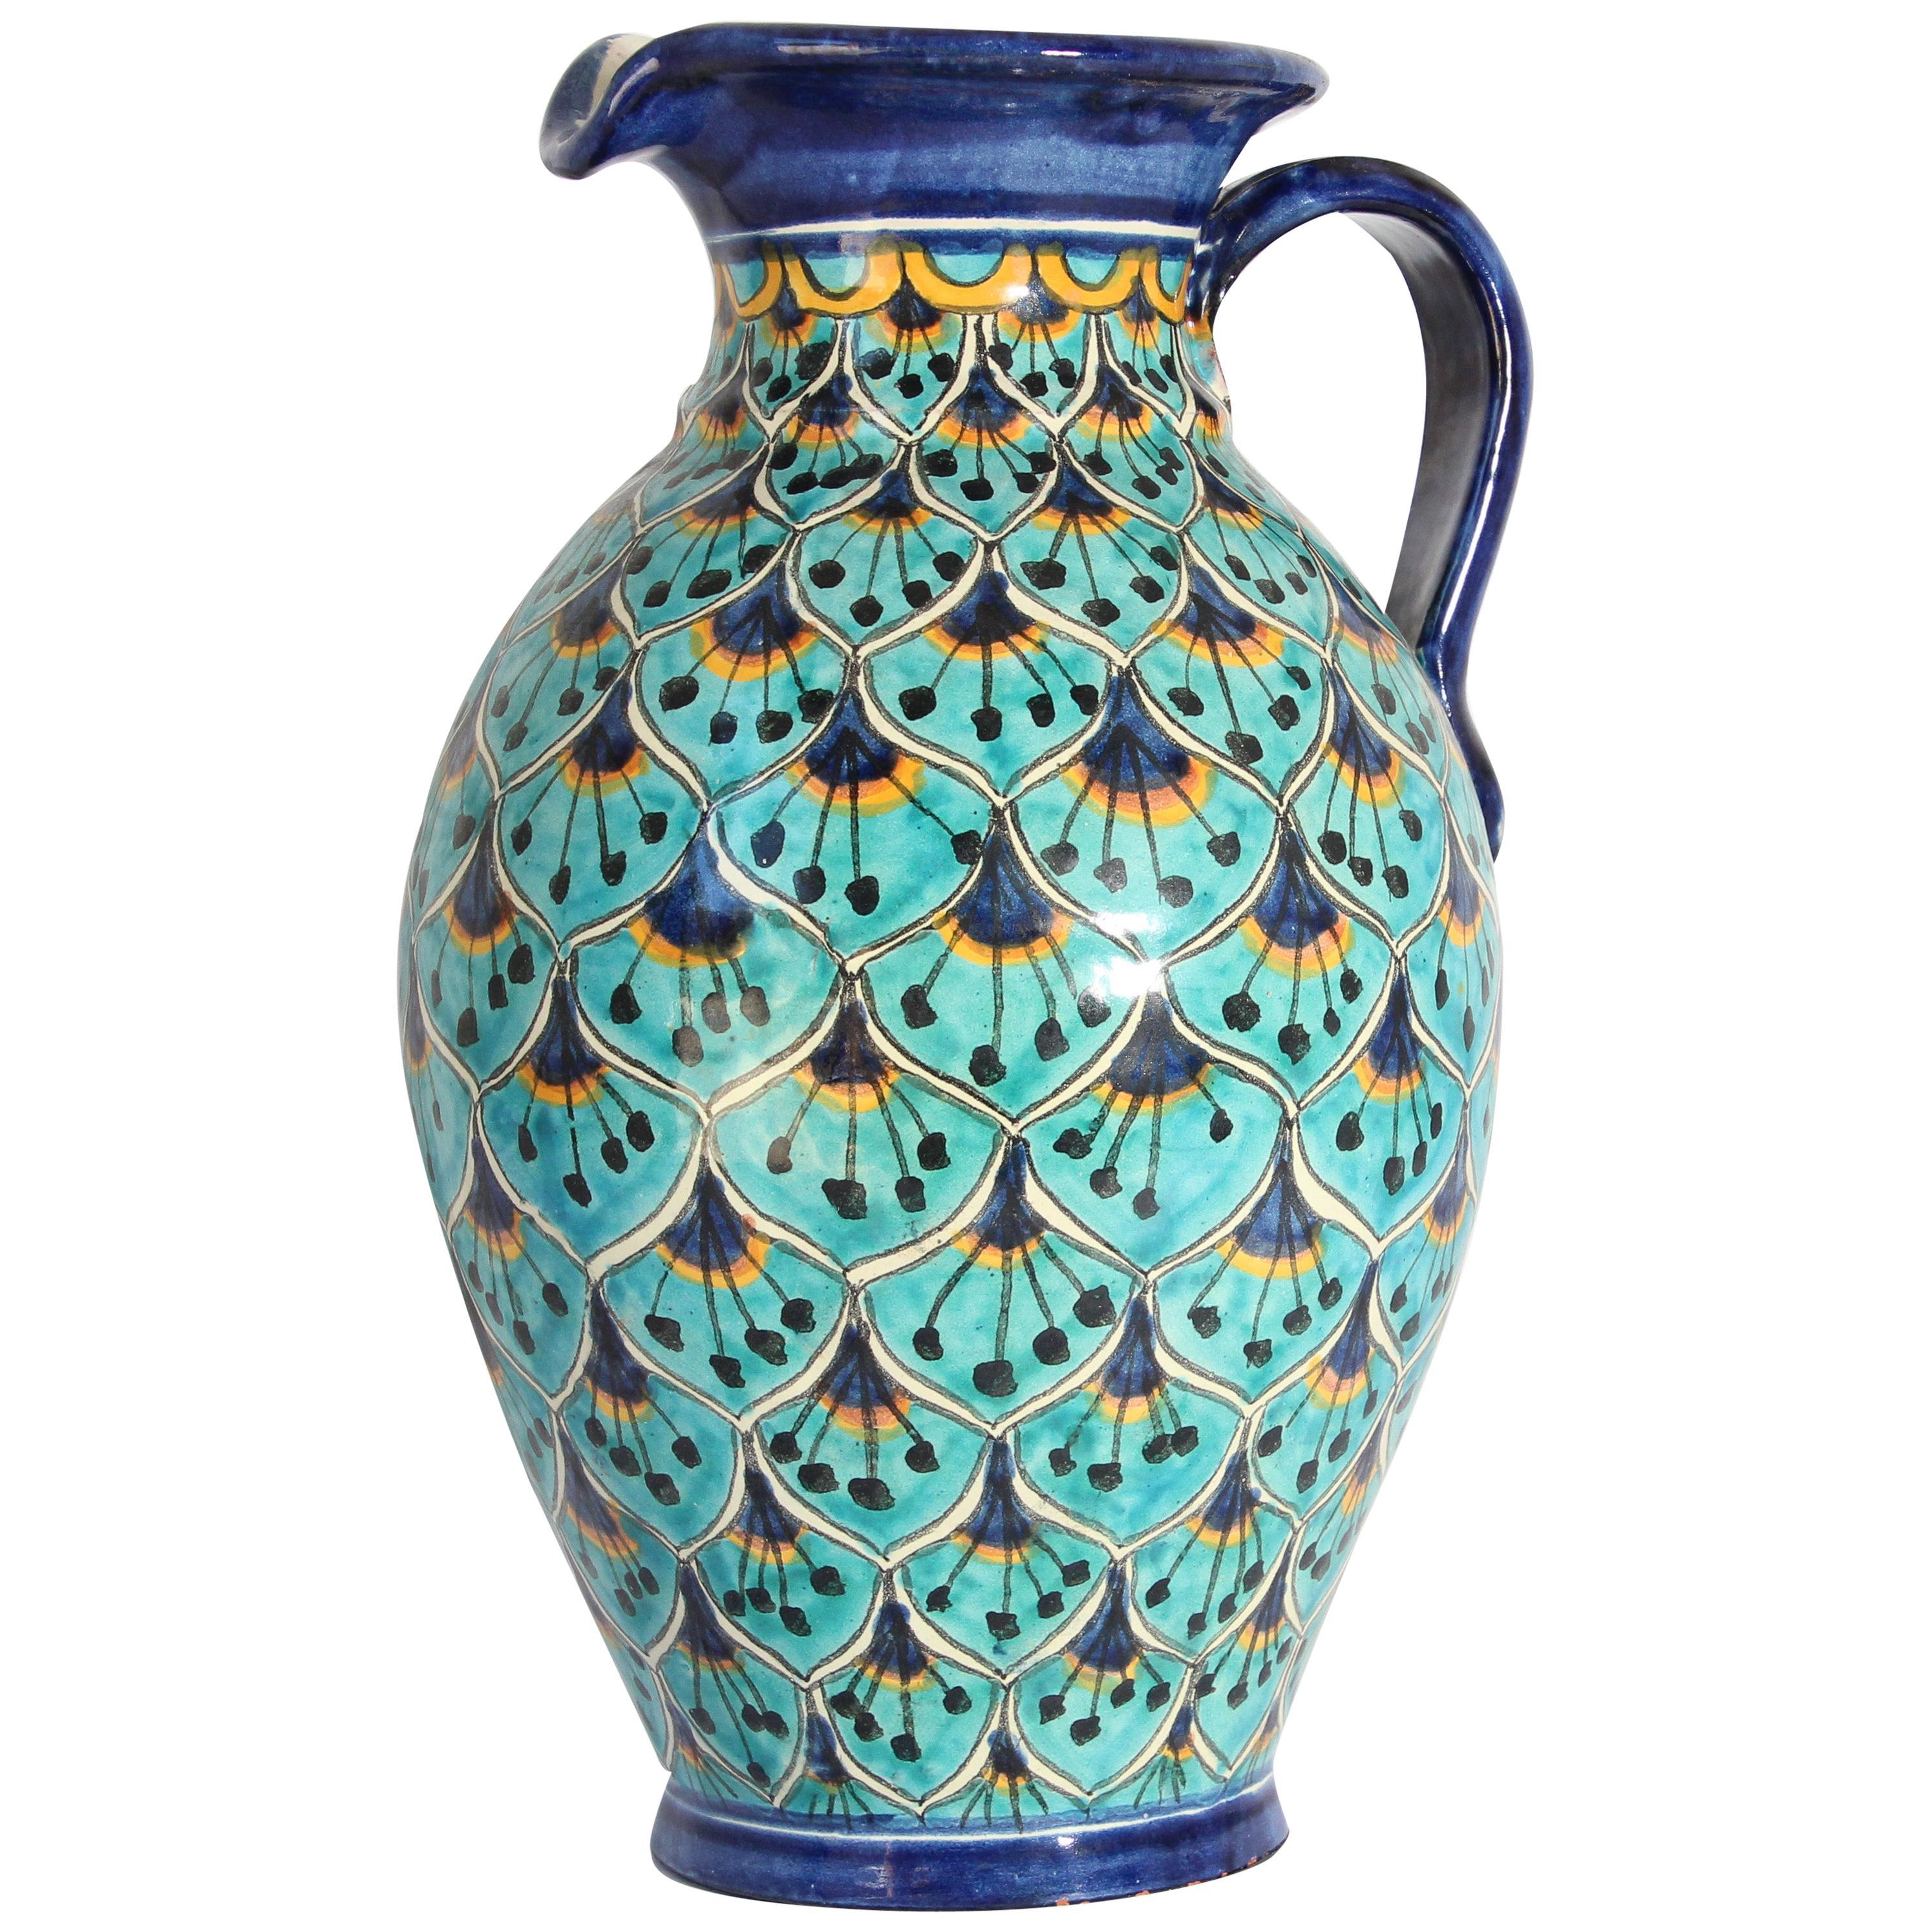 Ceramic Glazed Moorish Pitcher Vase Handcrafted in Spain